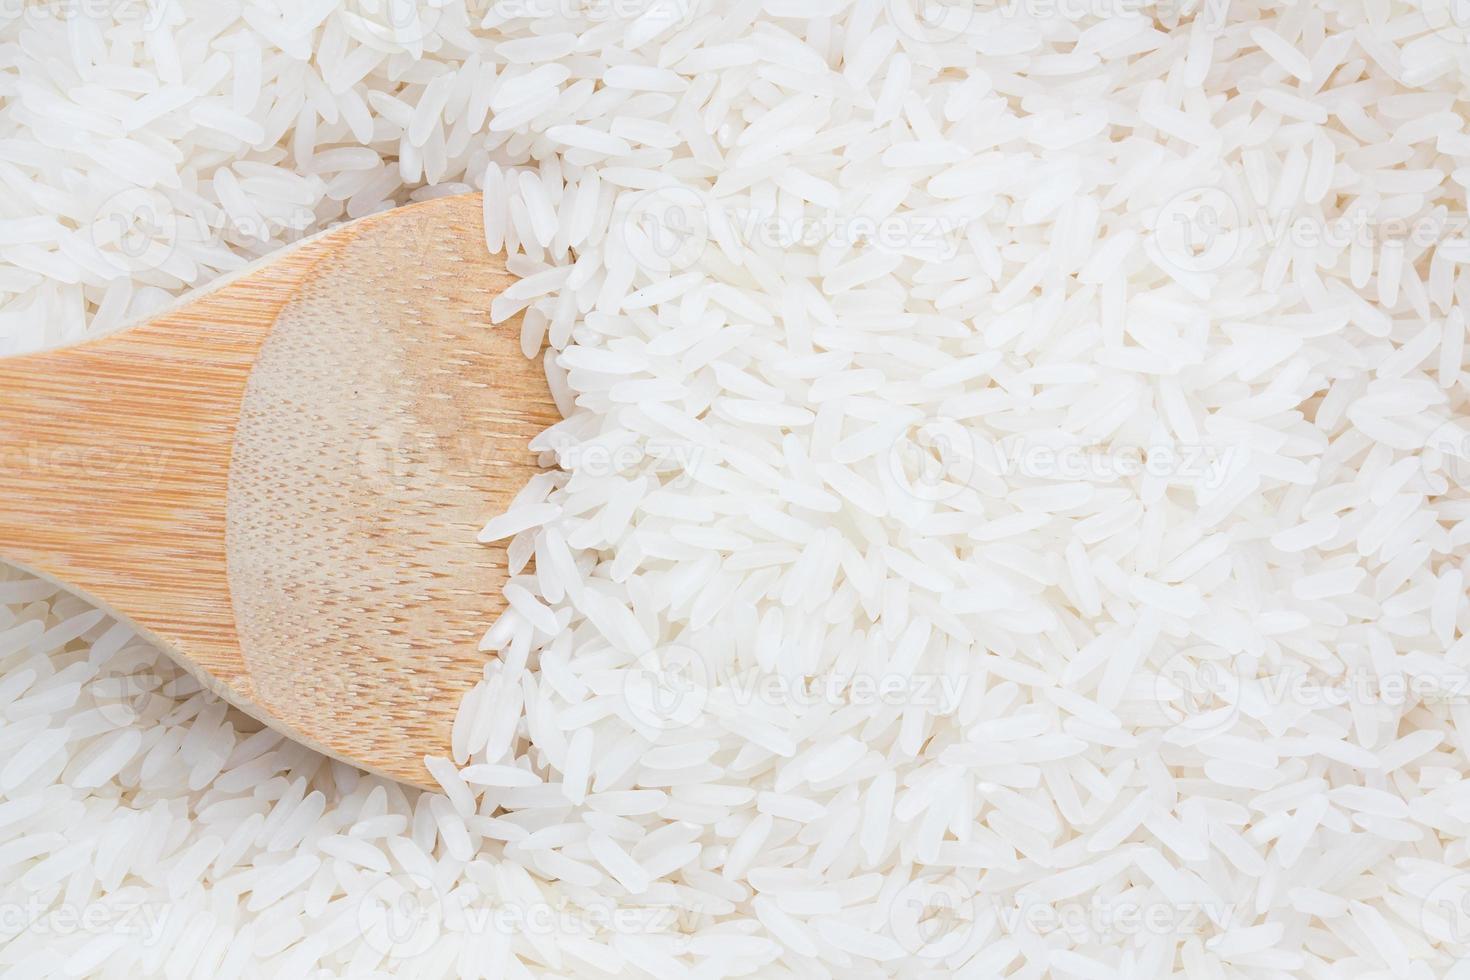 Reis auf Holzlöffel foto